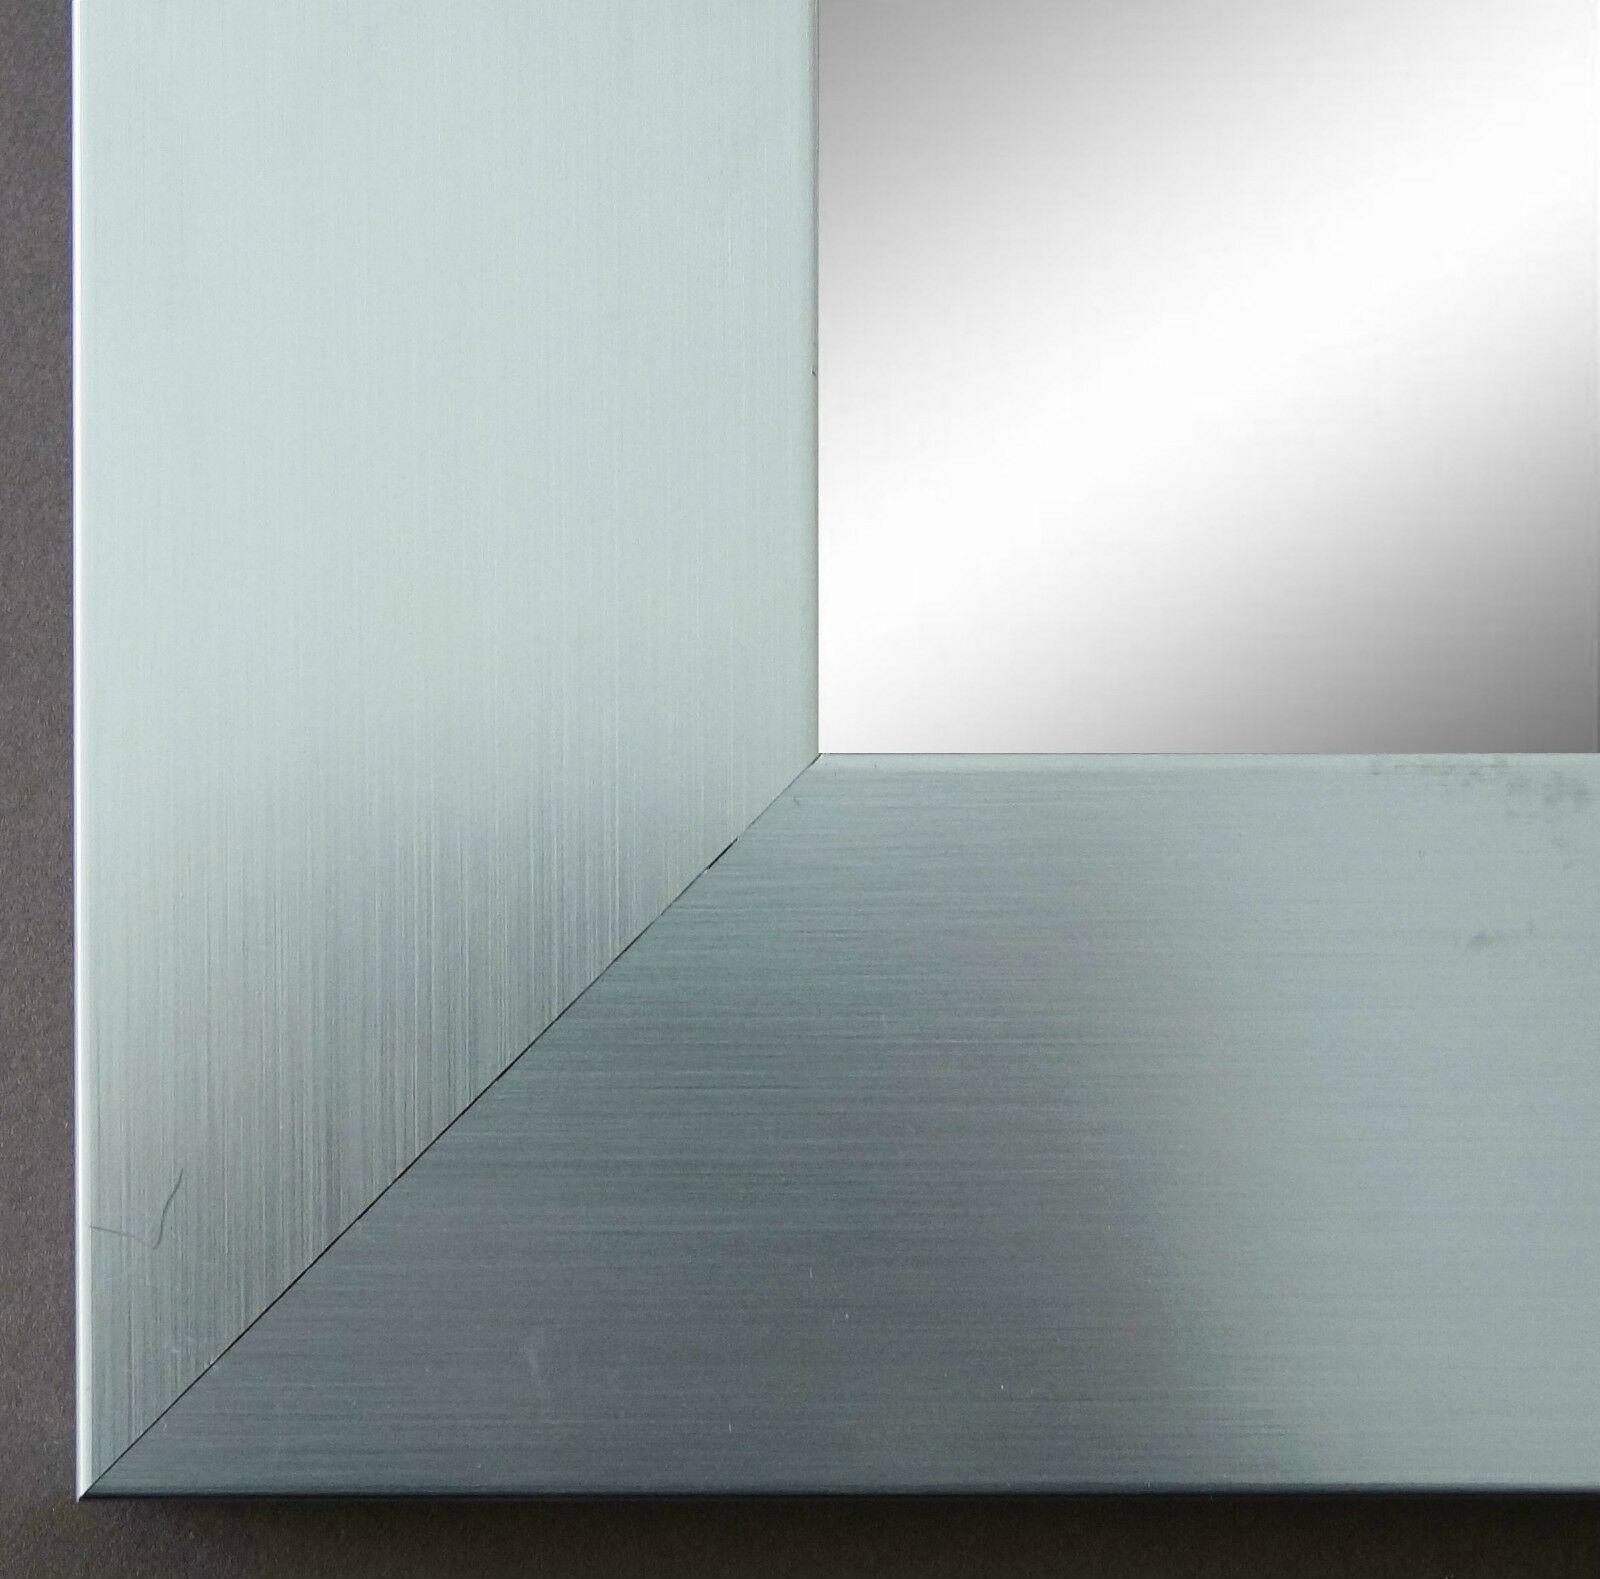 Wandspiegel Silber Modern spiegel silber modern wandspiegel badspiegel flurspiegel vintage